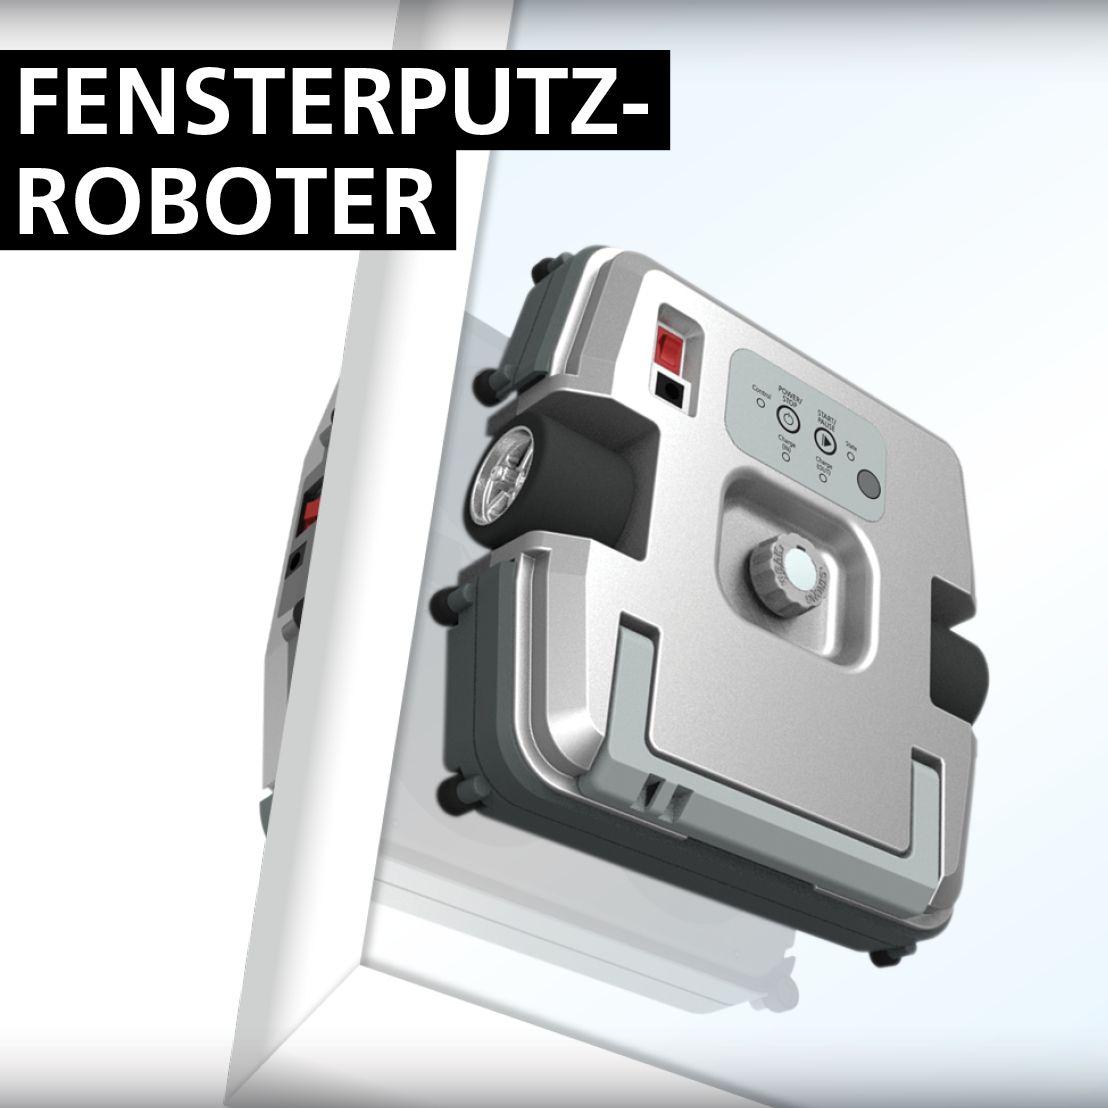 Fensterputzroboter Cleanbot W28 Nur Geeignet Fur 2 Fach Verglasung Fenster Putzen Haushaltsroboter Roboter